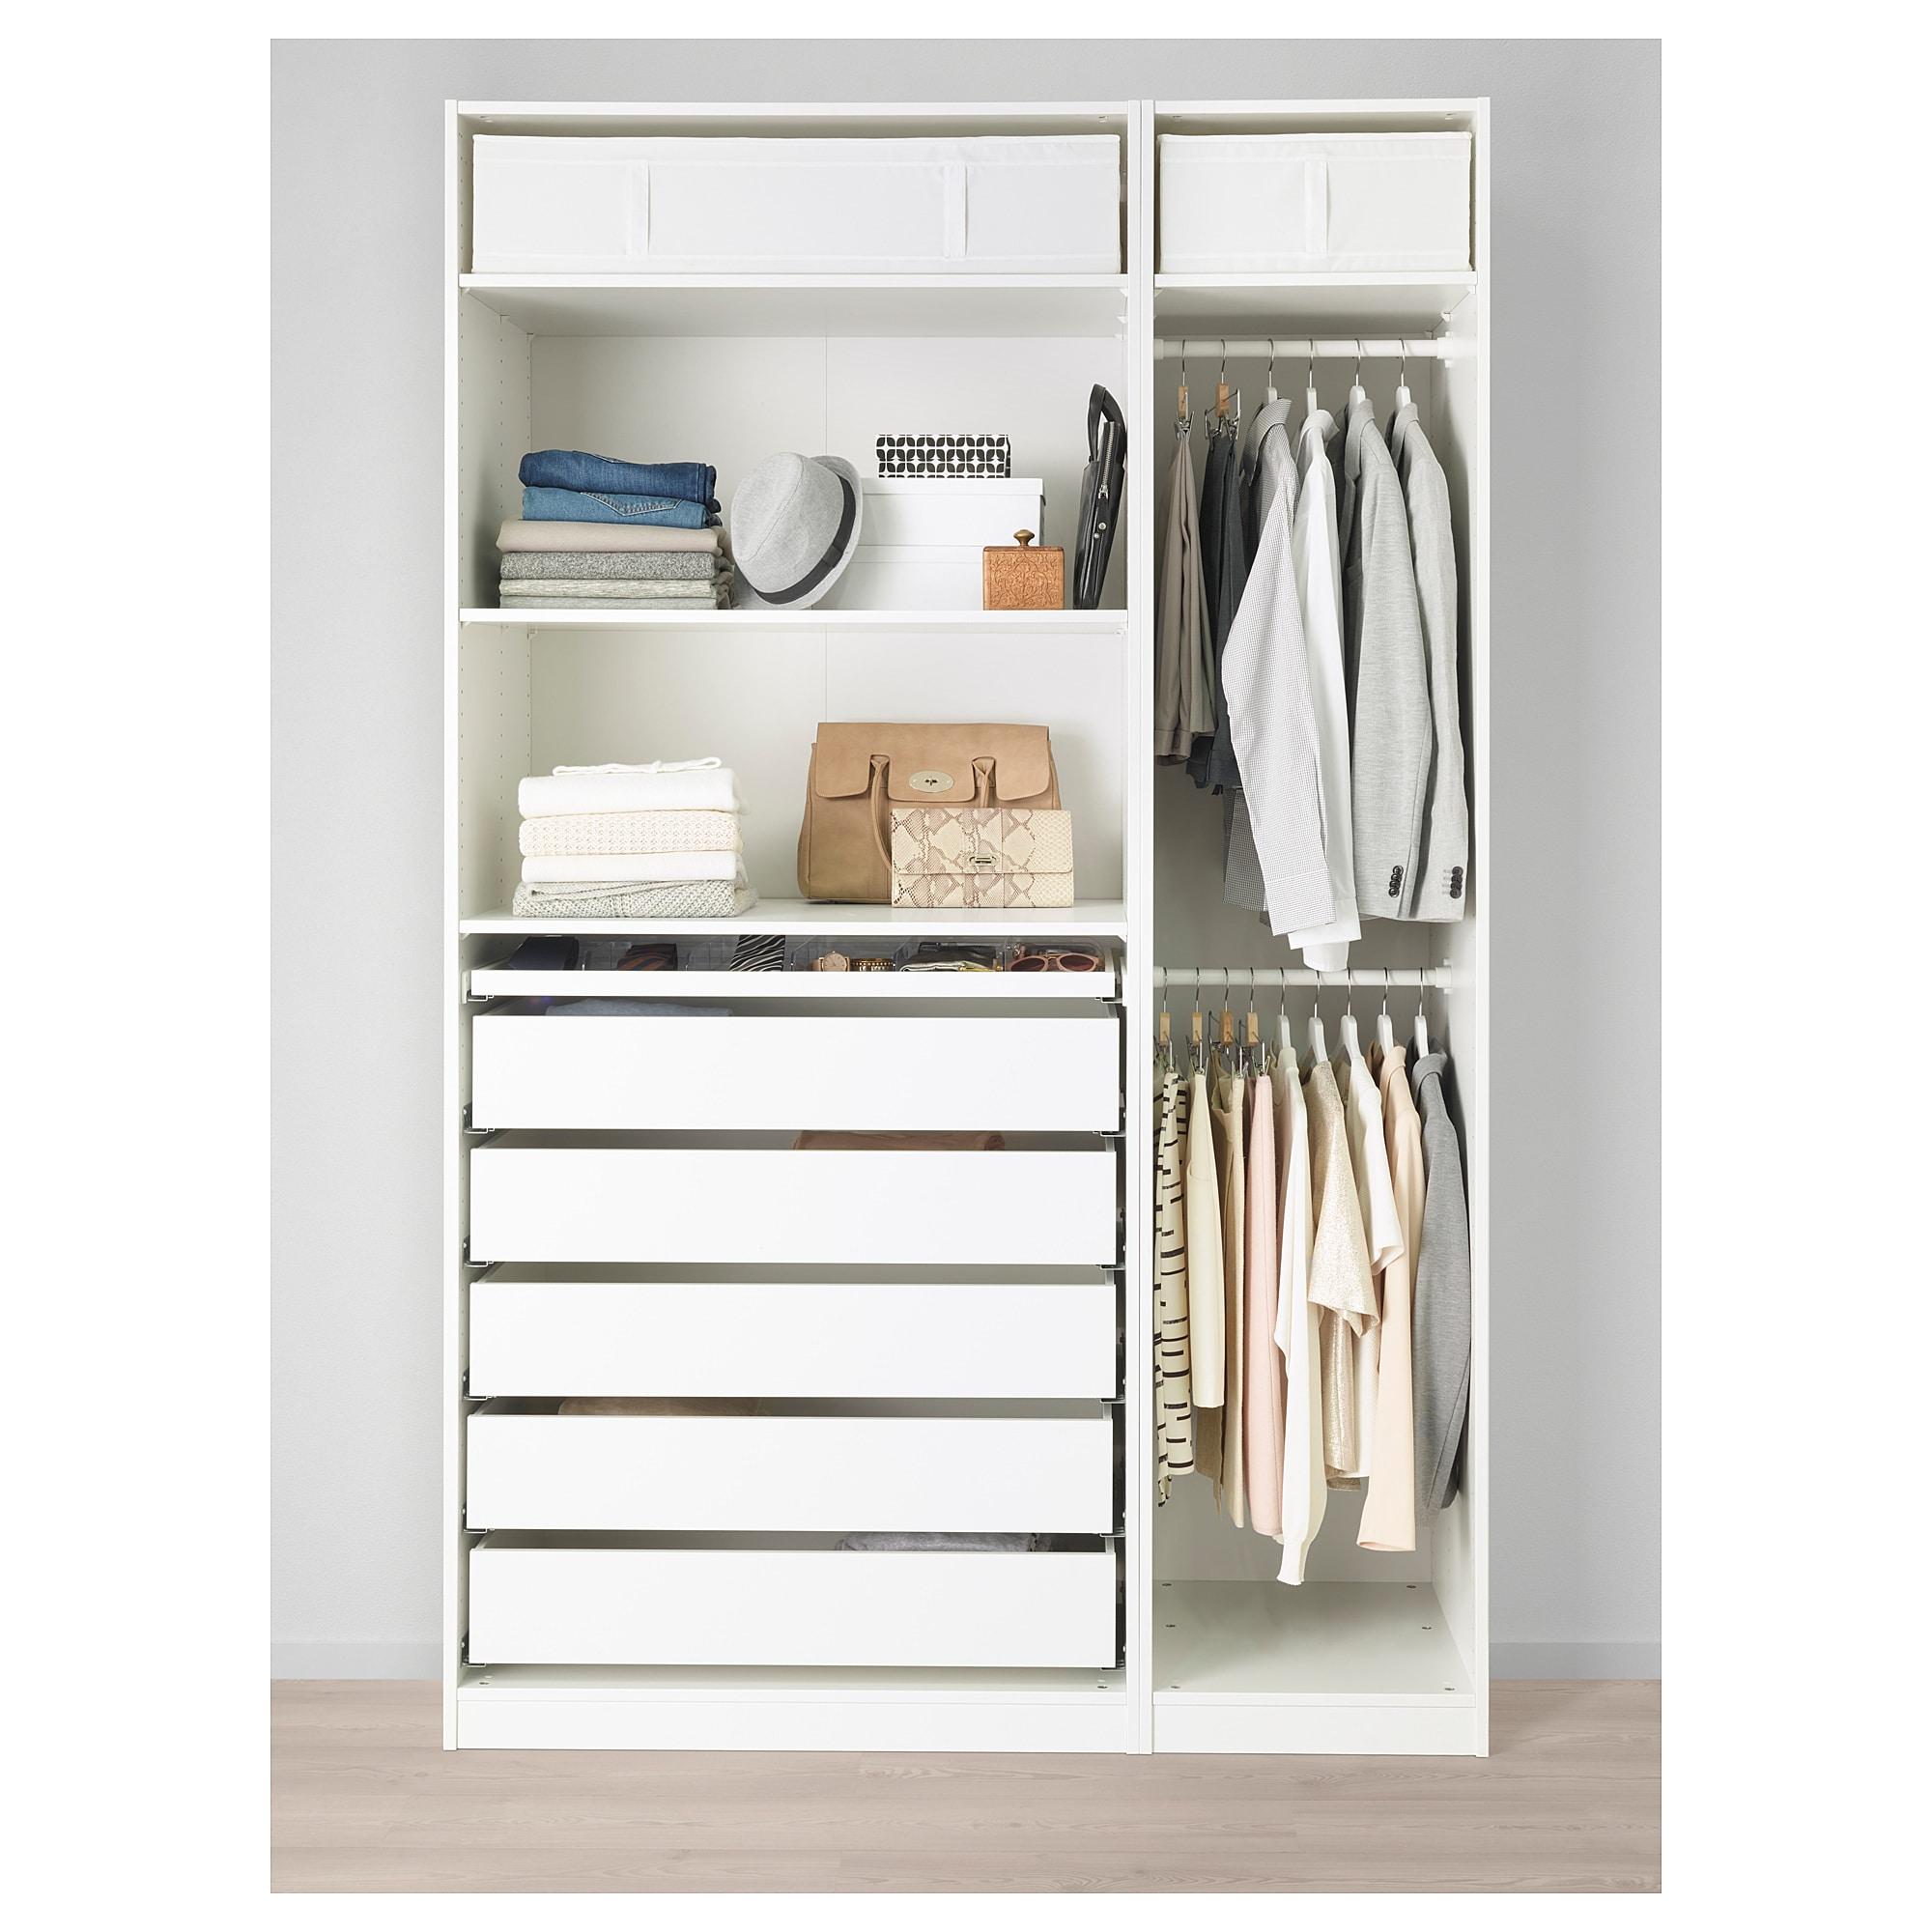 Pax Wardrobe White 59x22 7 8x93 1 8 150x58x236 Cm Pax